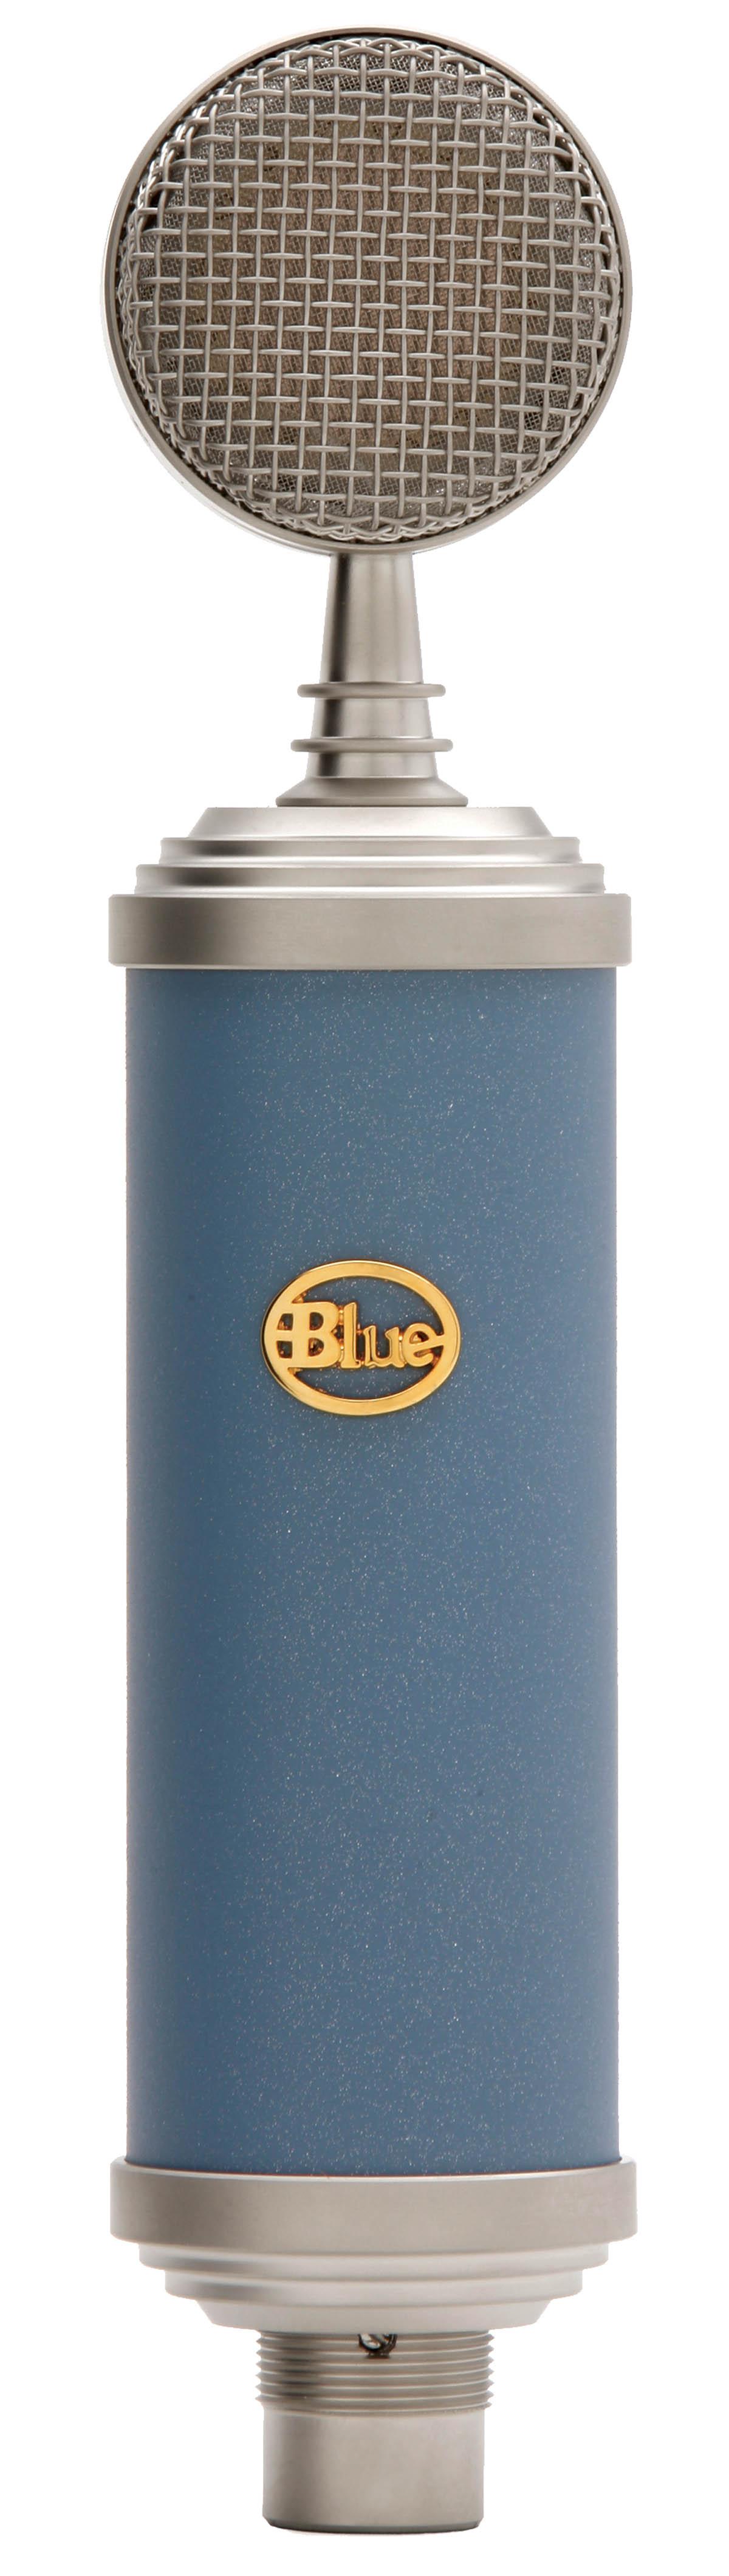 Bluebird Microphone